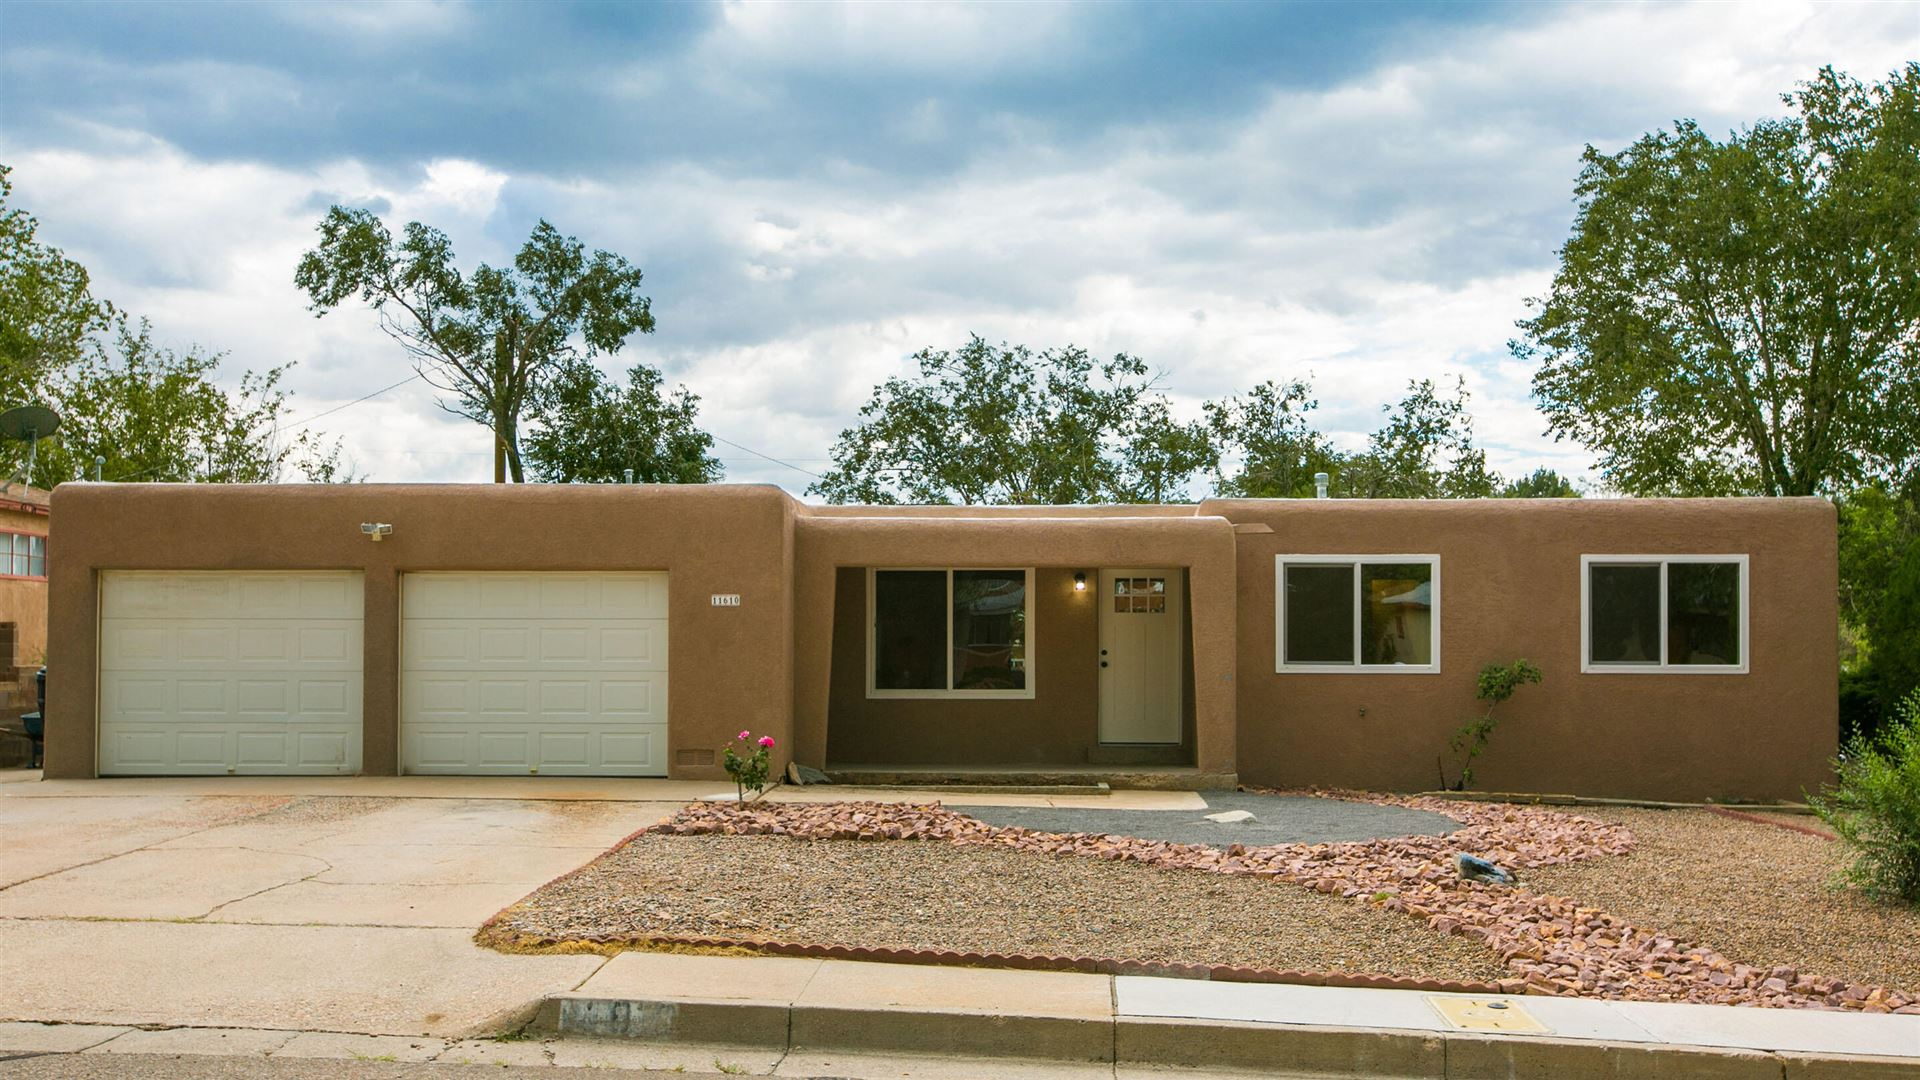 11610 Snow Heights Boulevard NE, Albuquerque, NM 87112 - #: 997747